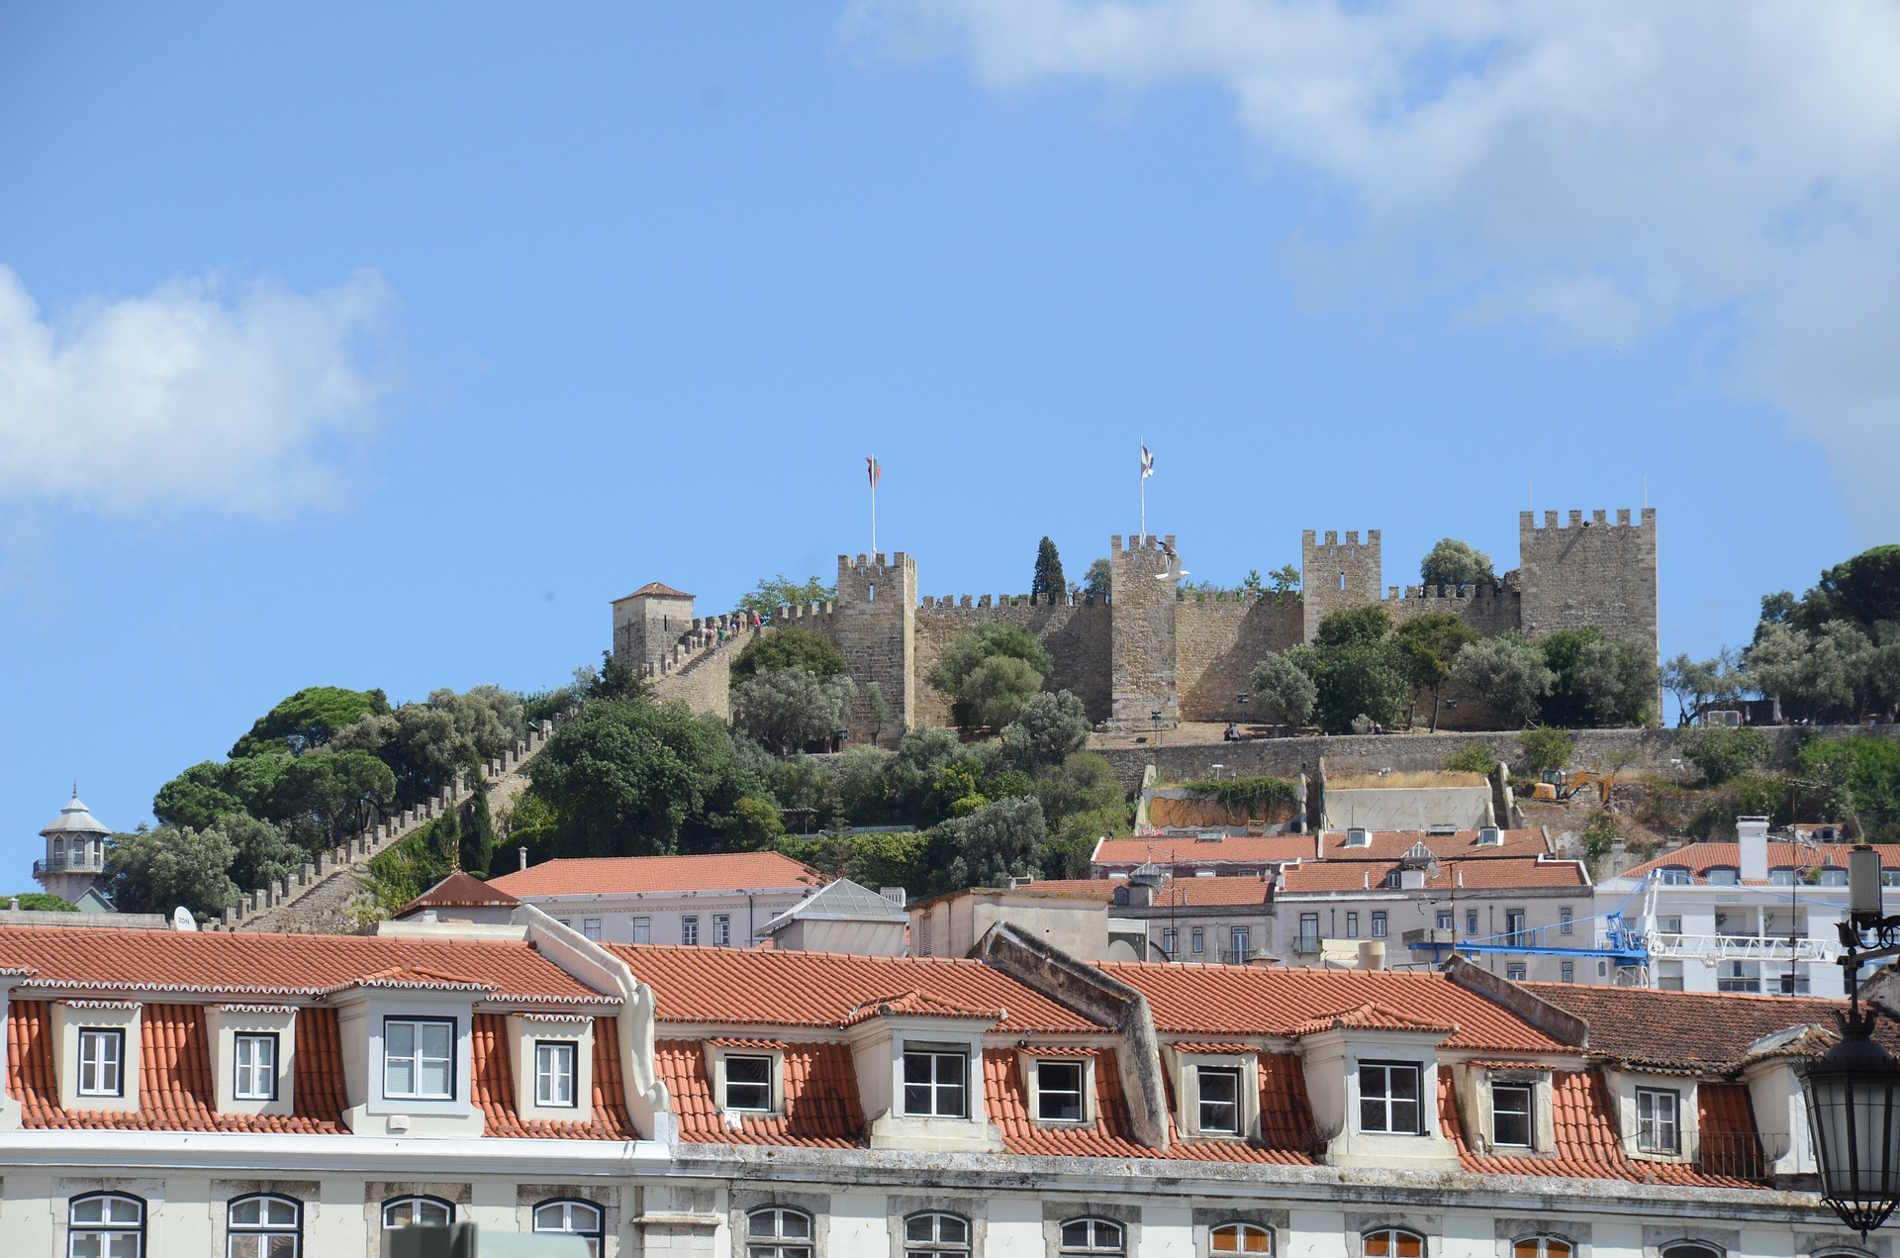 Capitali Europee da visitare: Panorama sul castello di Sao Jorges a Lisbona Europa